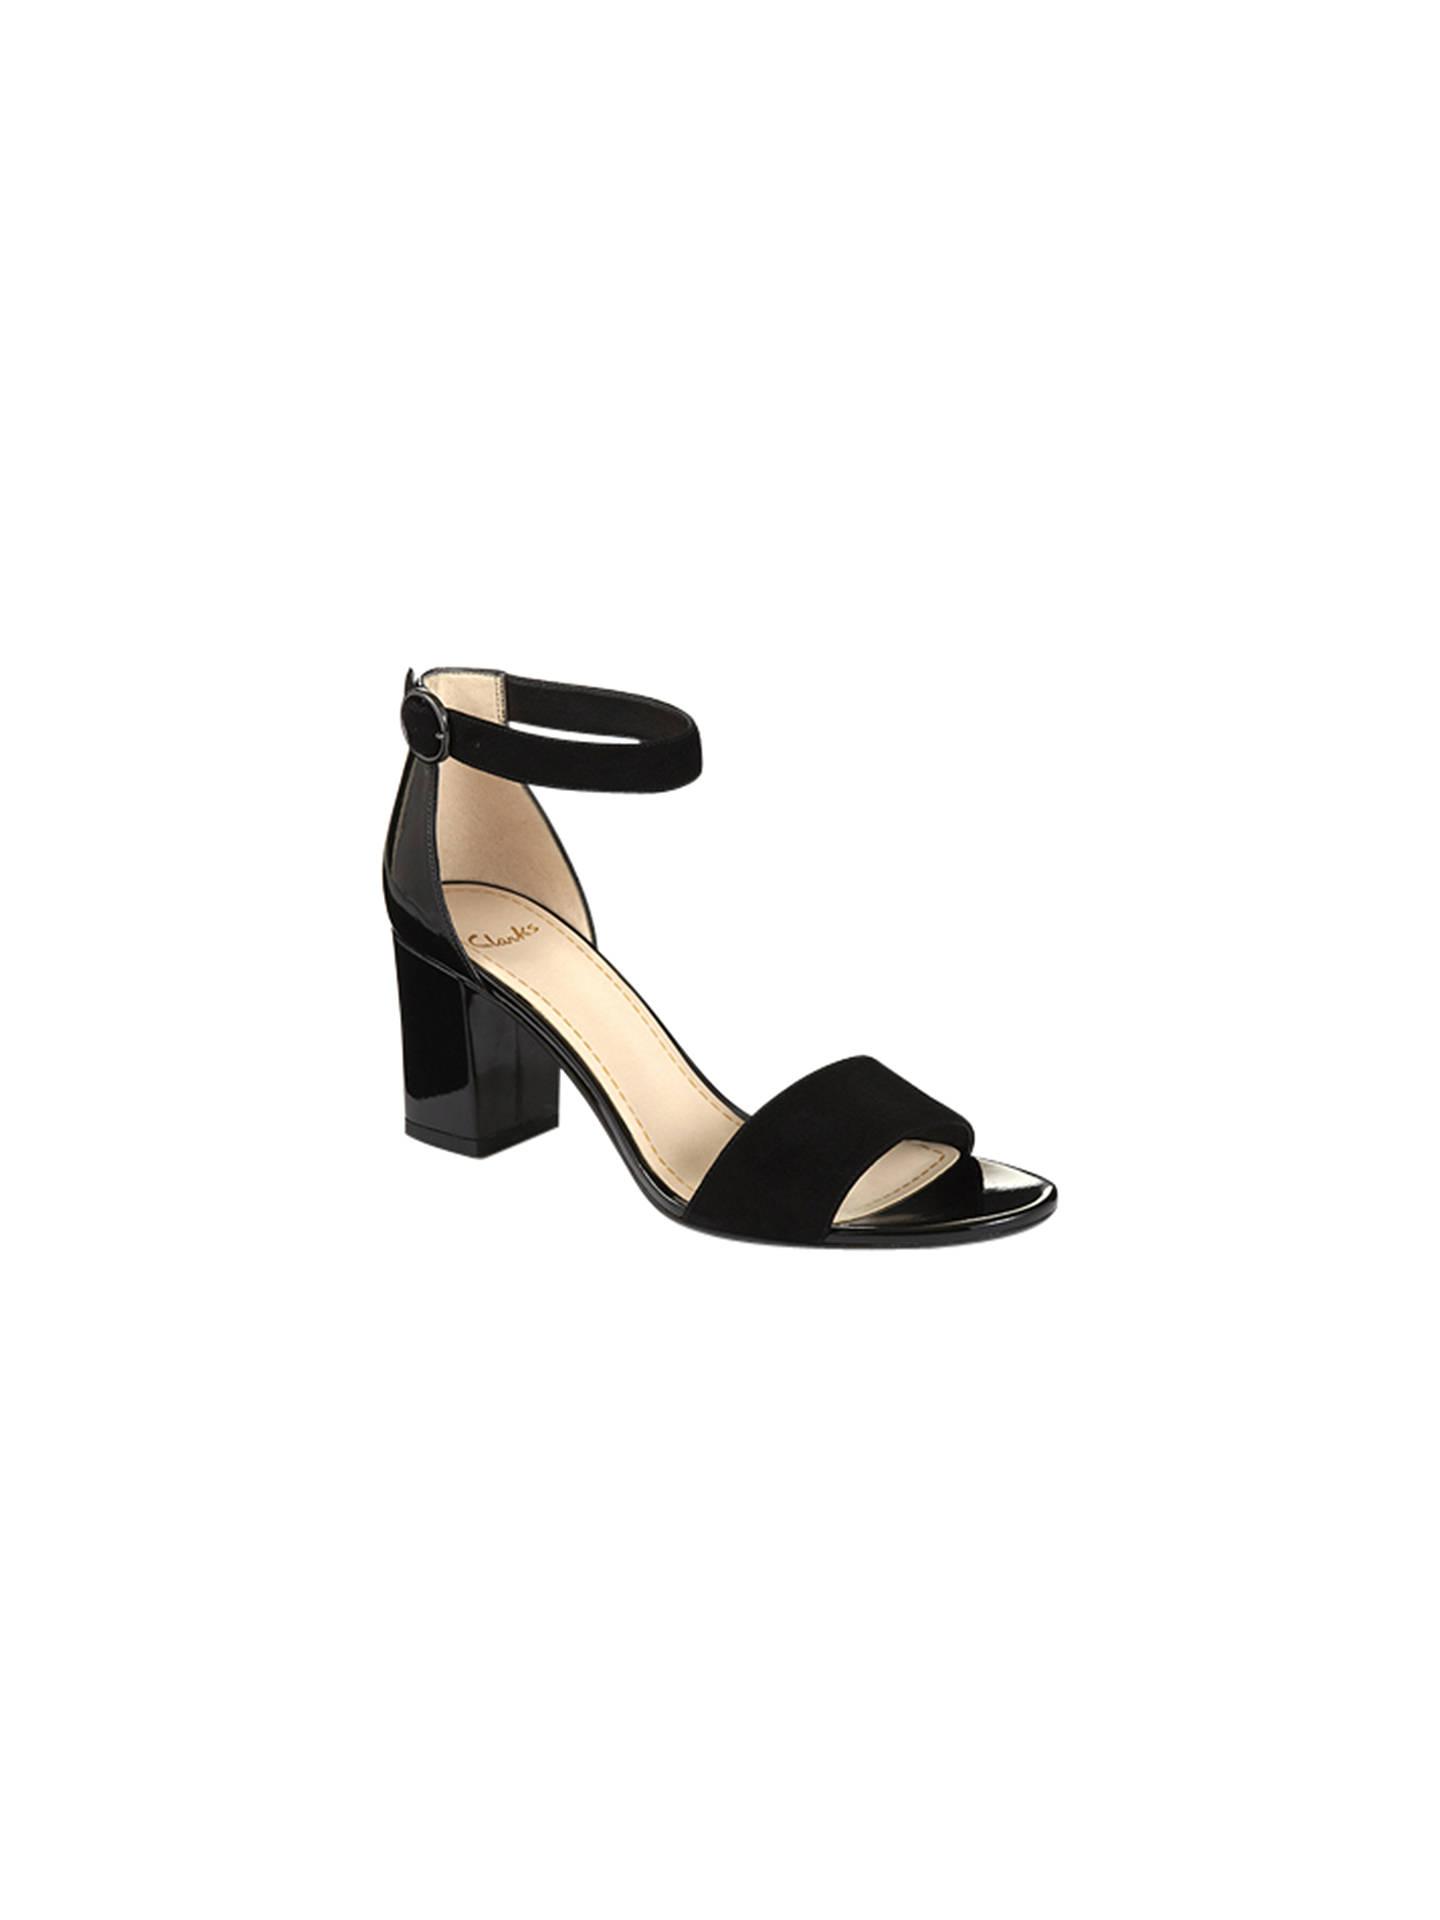 681a9490f Buy Clarks Susie Deva Leather Block Heel Sandals, Black, 4 Online at  johnlewis.